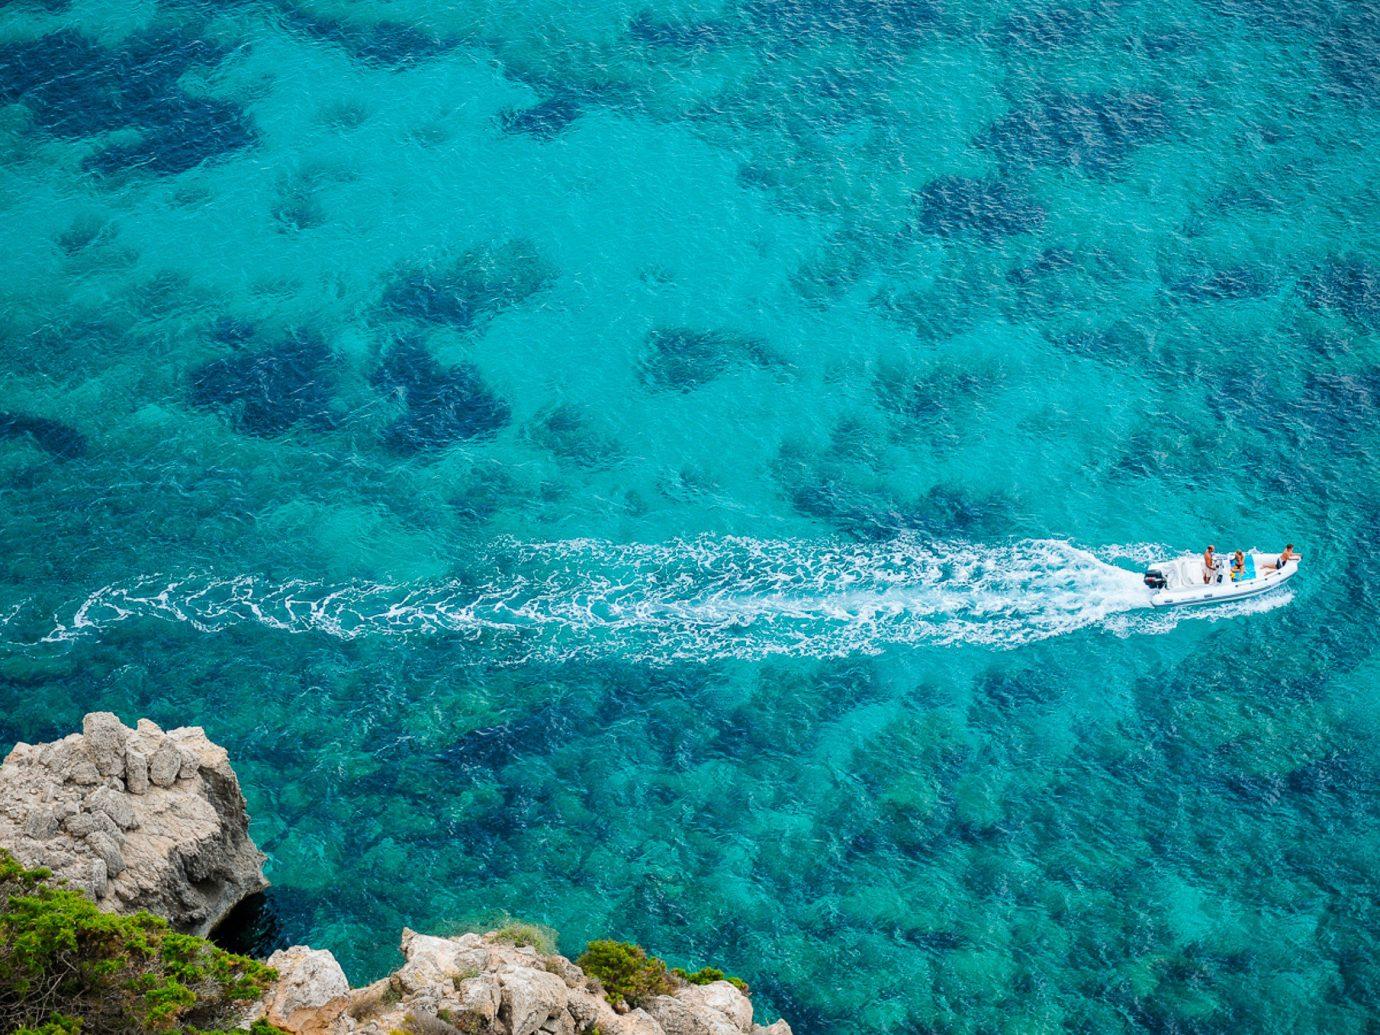 Trip Ideas water rock Sea reef underwater ecosystem marine biology coral reef outdoor aqua Ocean organism coastal and oceanic landforms coral fish Lagoon marine invertebrates shoal ocean floor